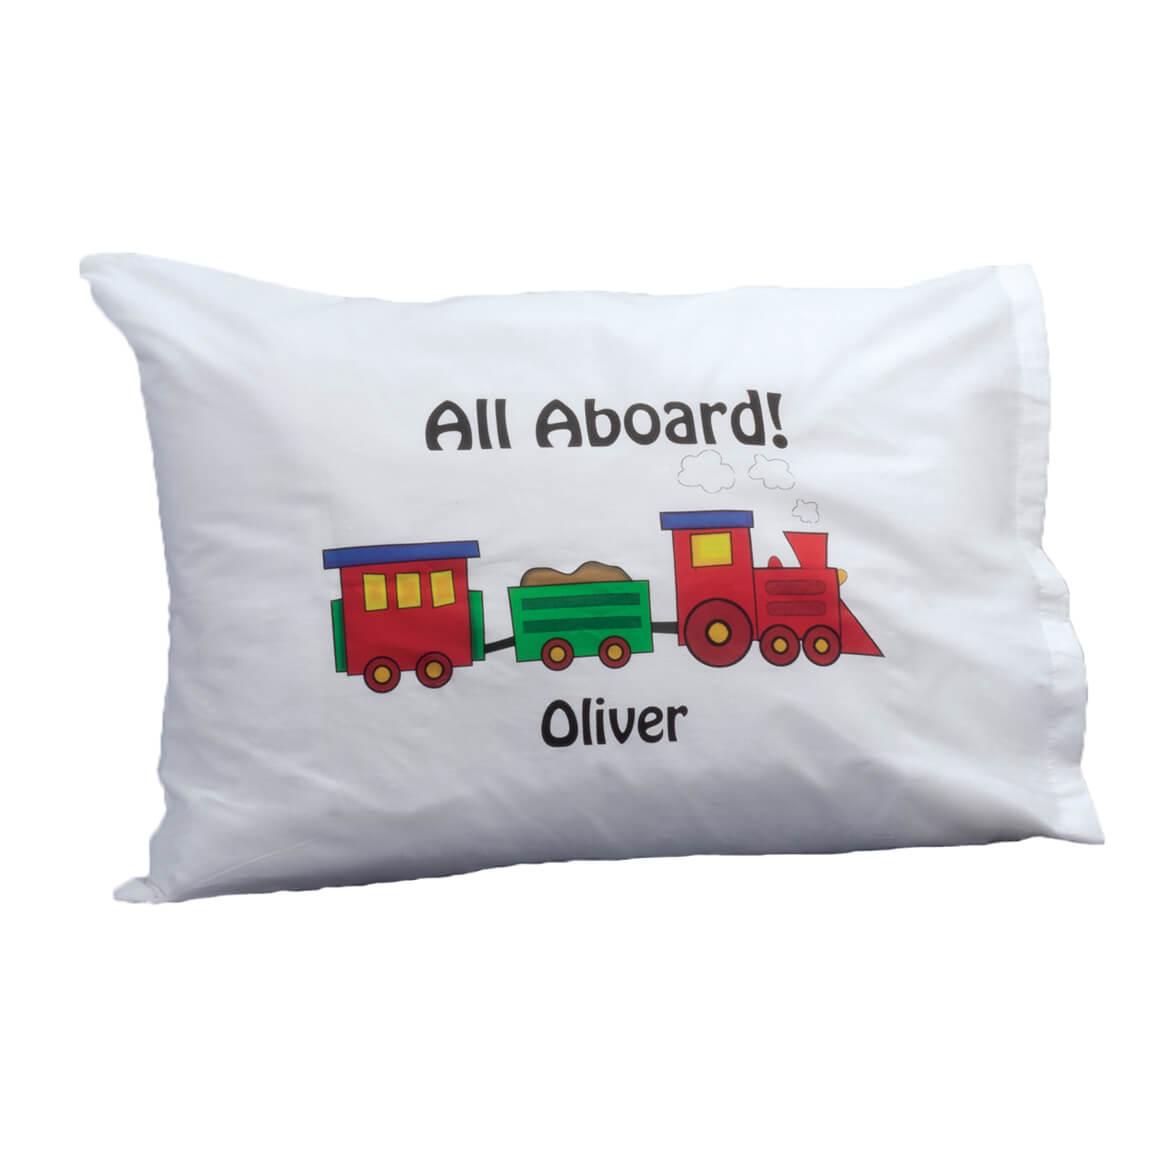 Personalized Train Pillowcase